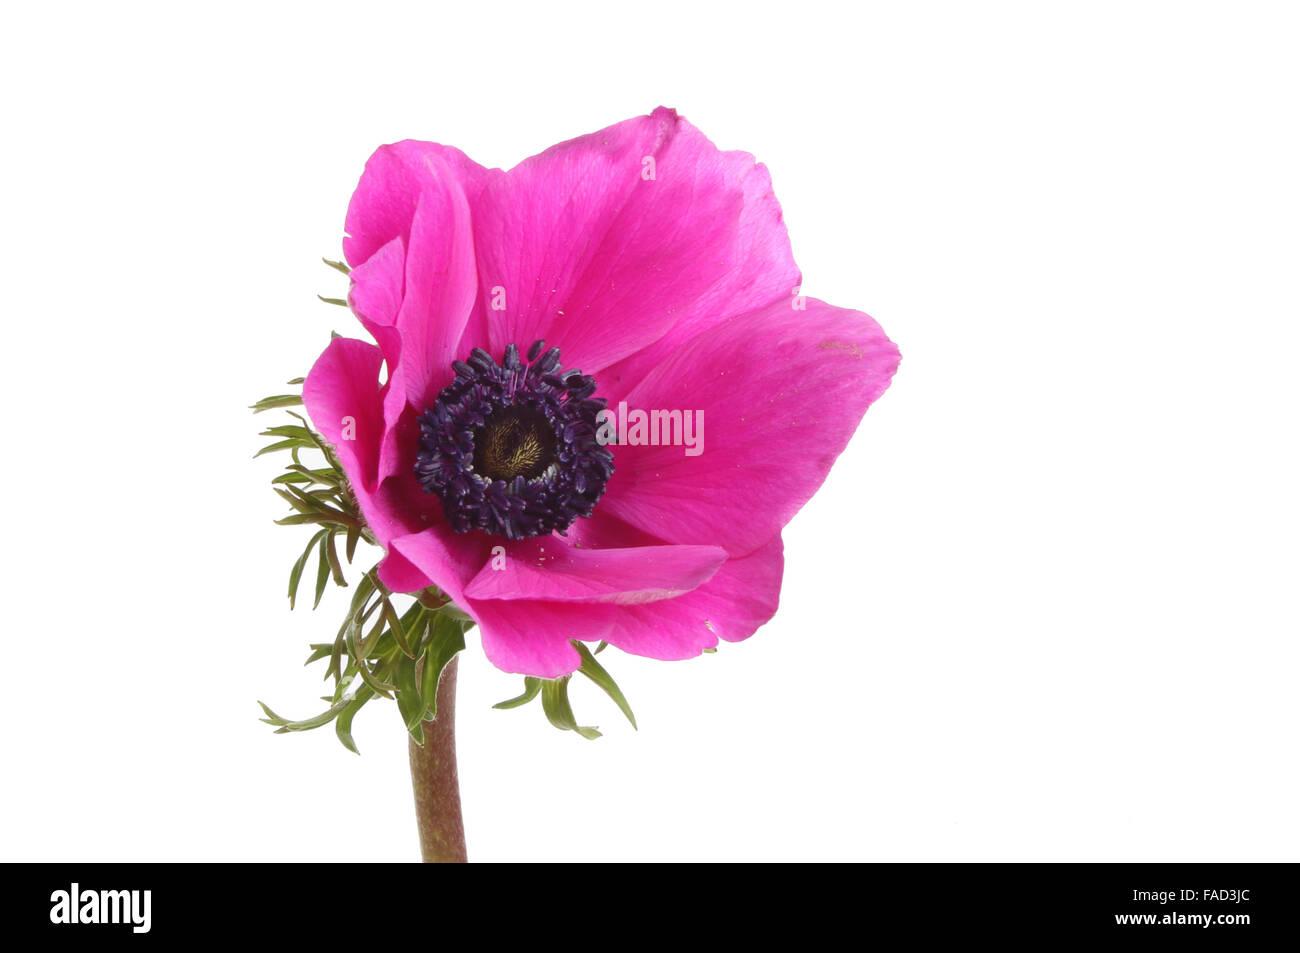 Magenta Anemone flower isolated against white - Stock Image